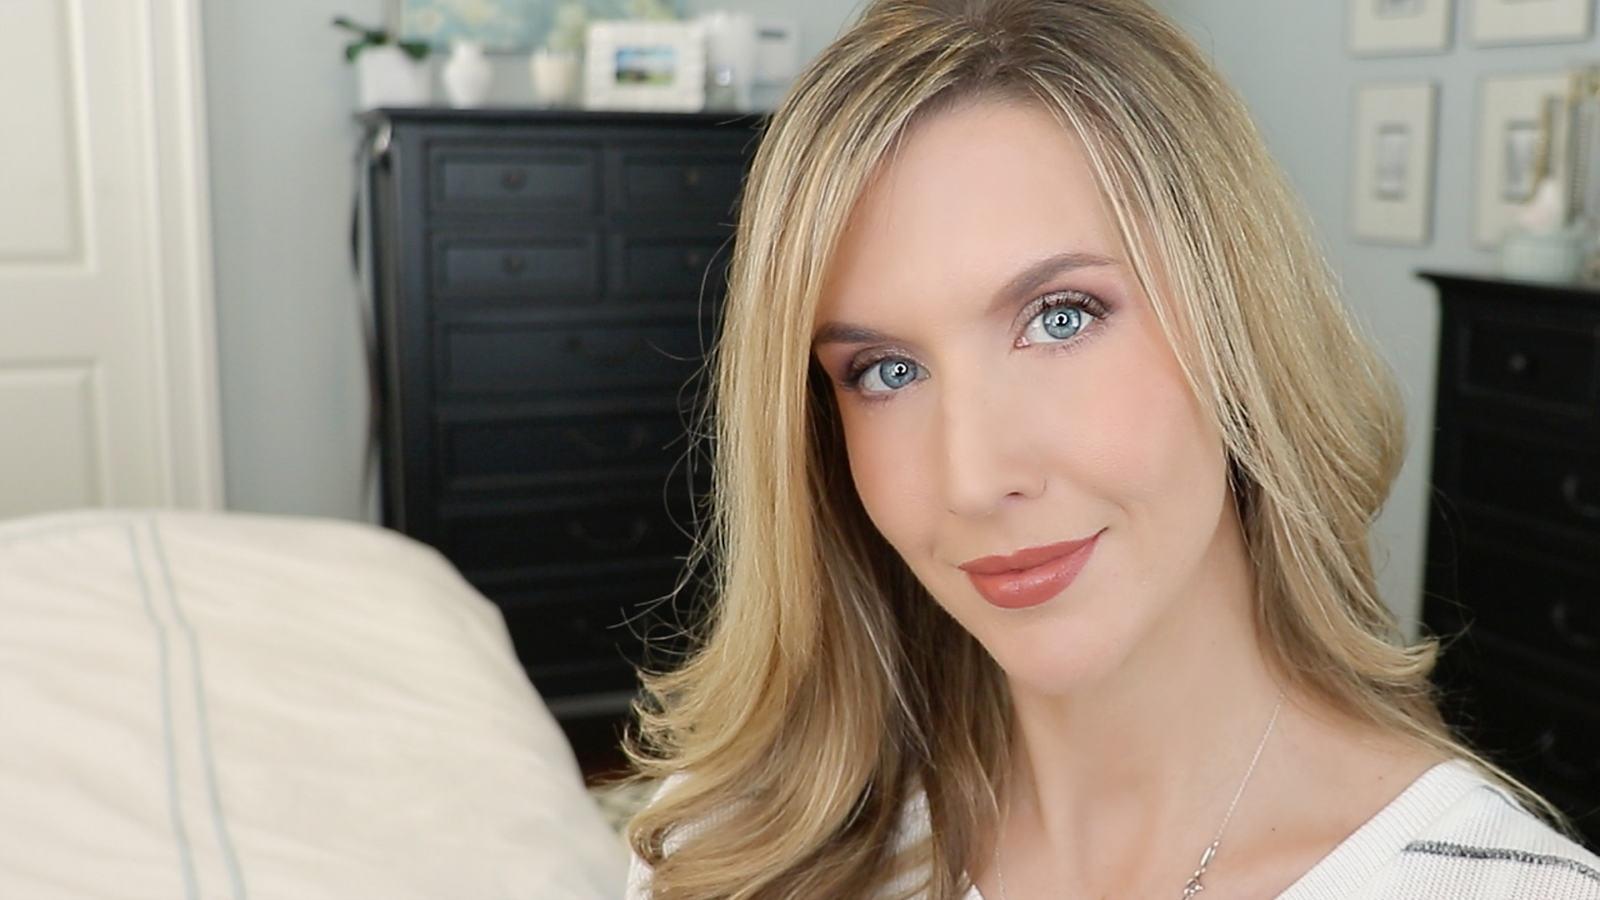 anti-aging nighttime skincare routine